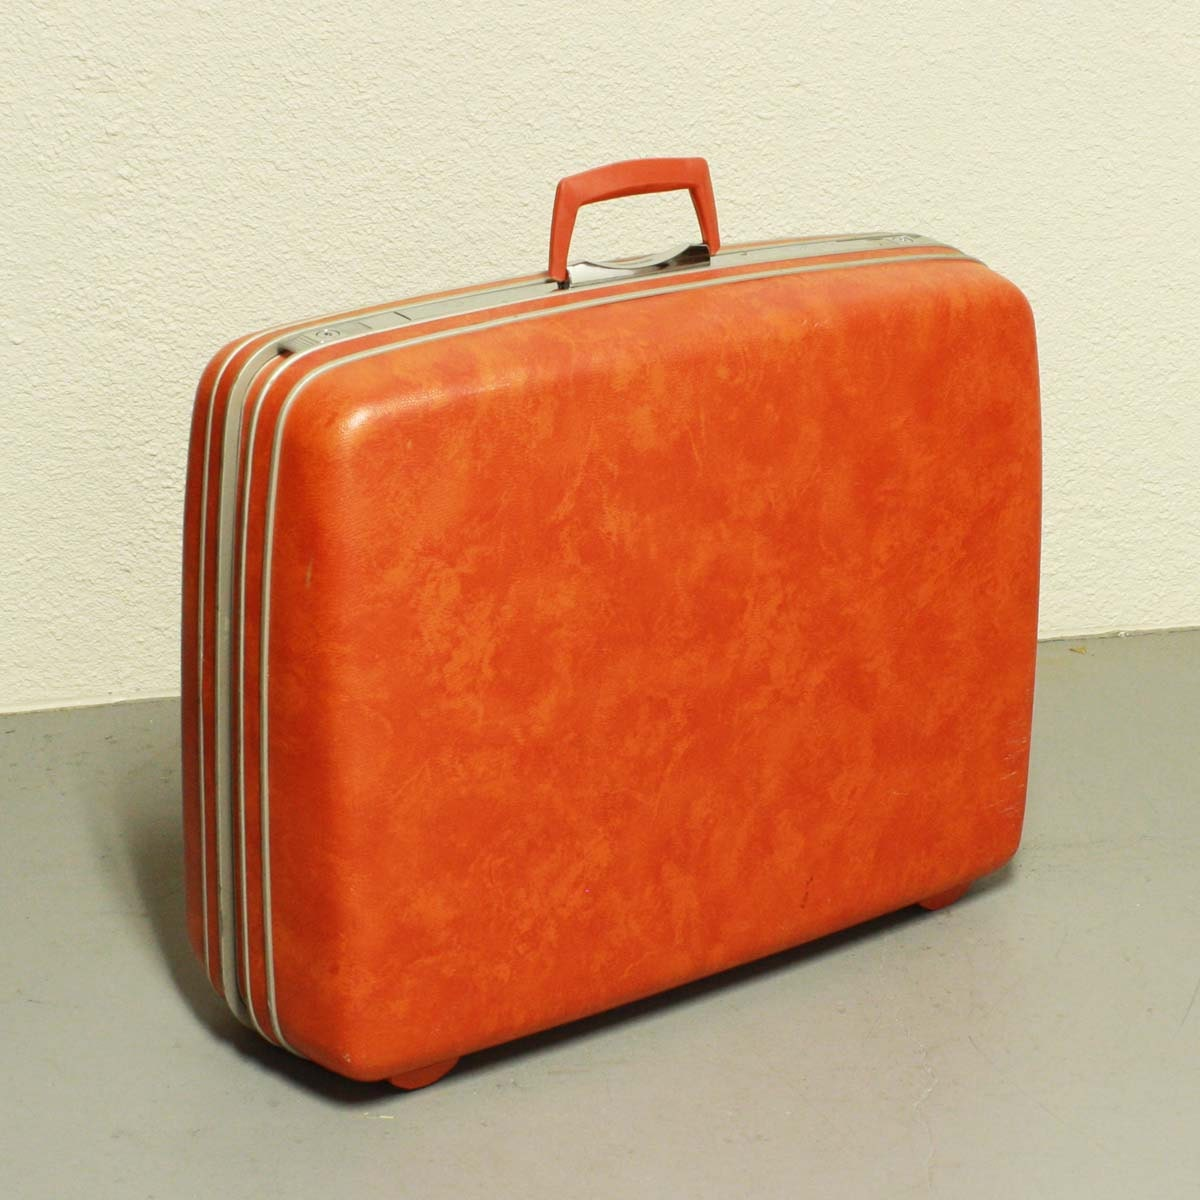 Vintage Suitcase Samsonite Silhouette Luggage Orange